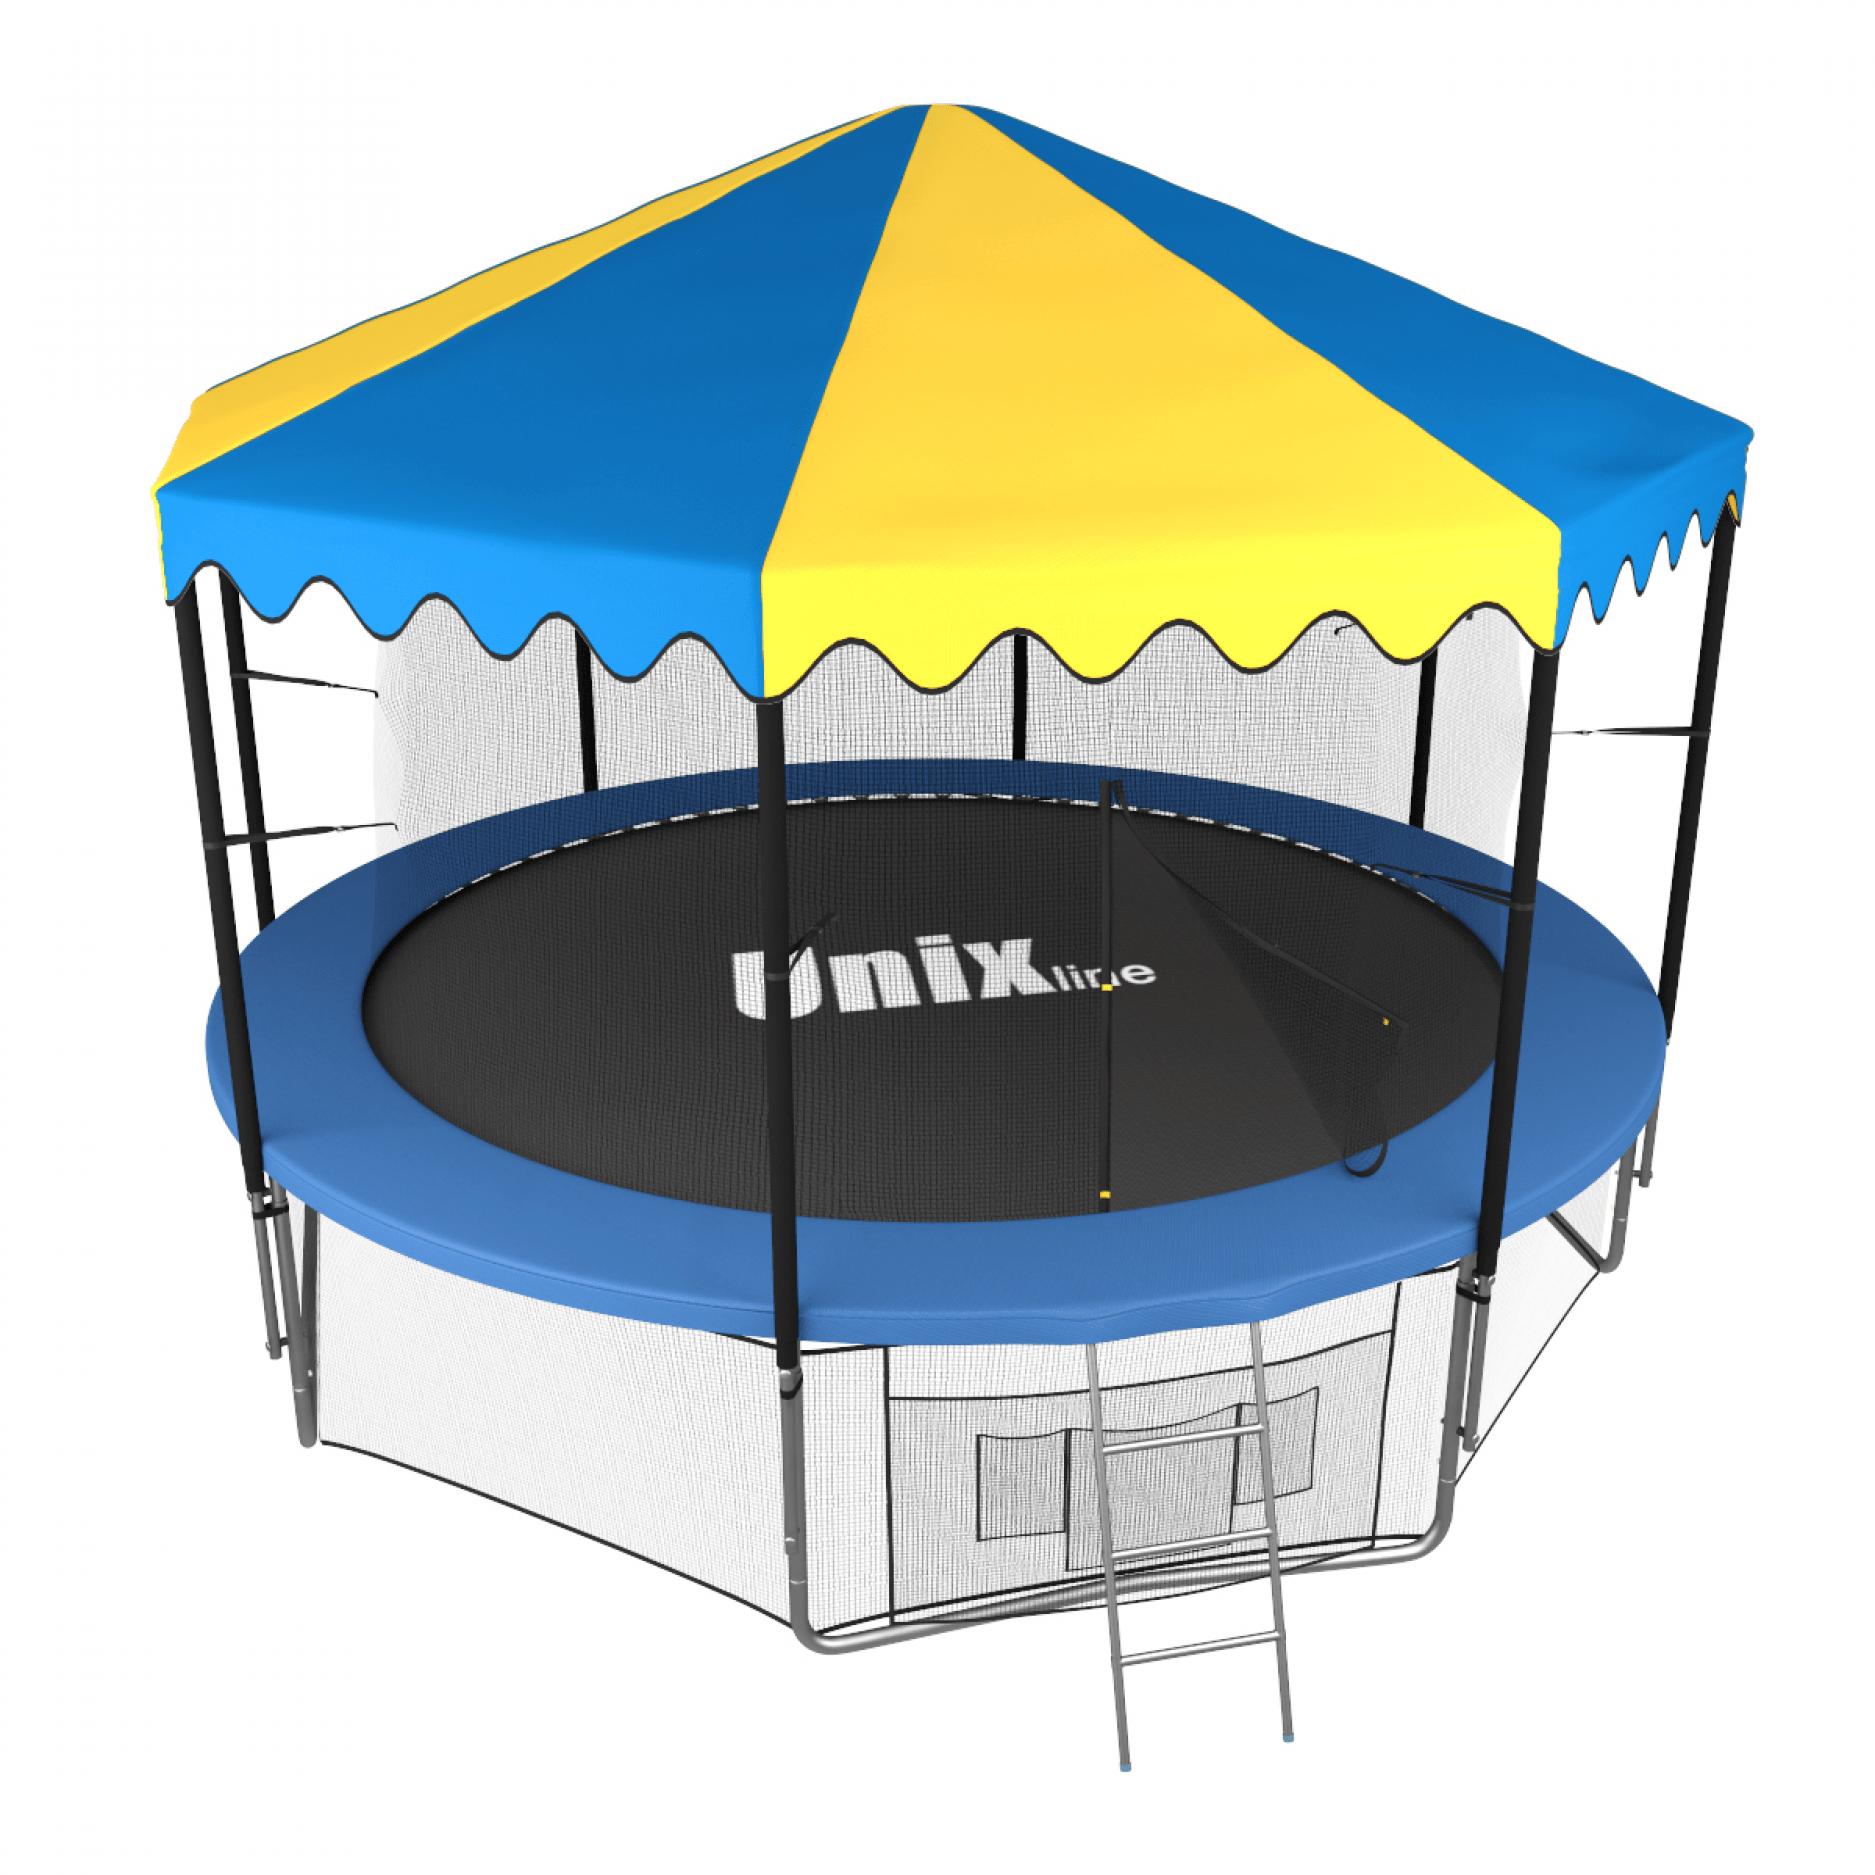 Батут UNIX line 12 ft inside с крышей (синий)